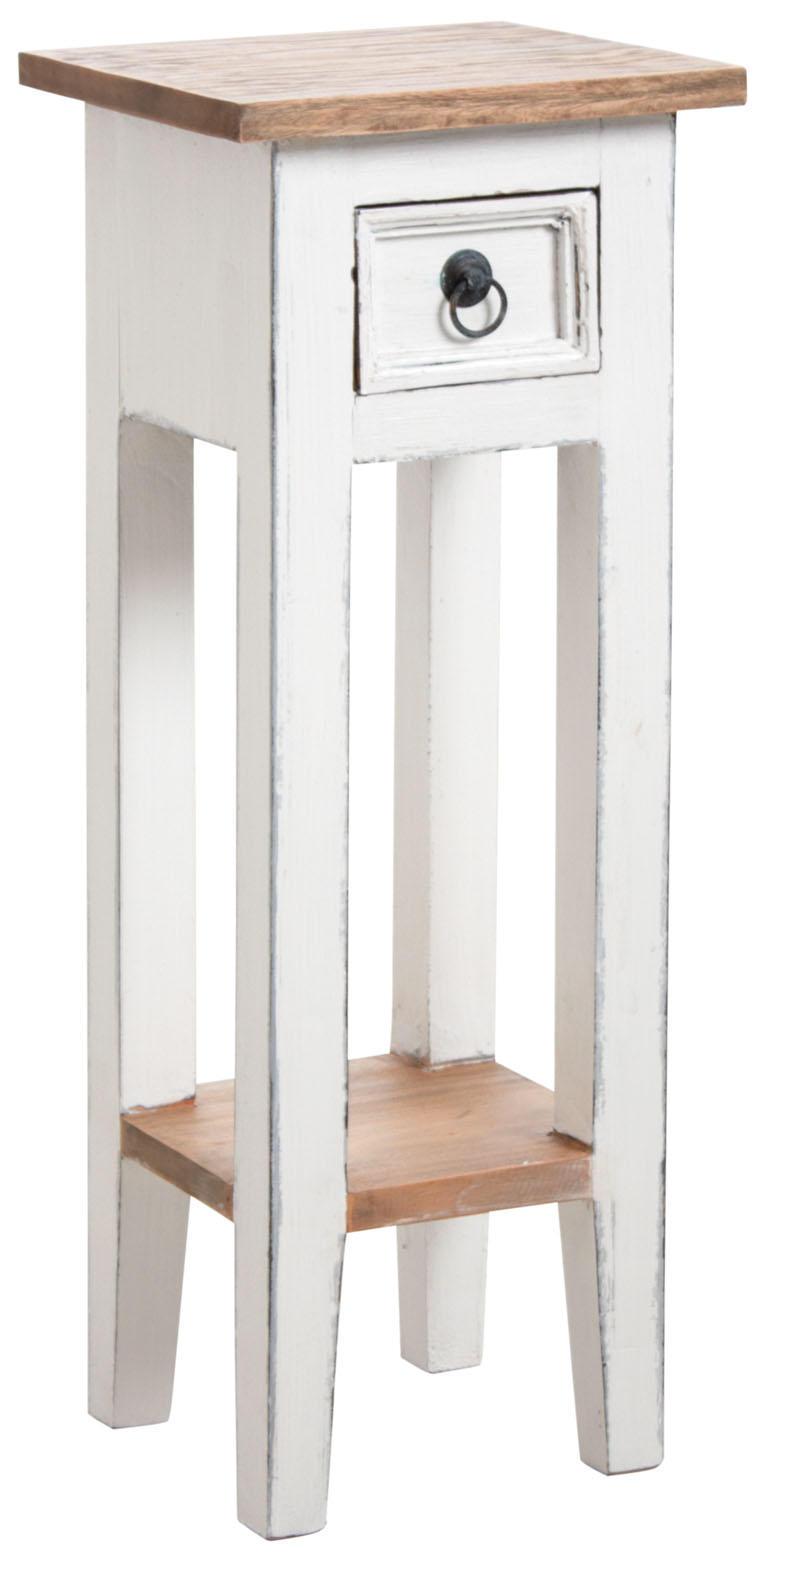 petite table carr e en bois blanc gu ridon aubry gaspard. Black Bedroom Furniture Sets. Home Design Ideas